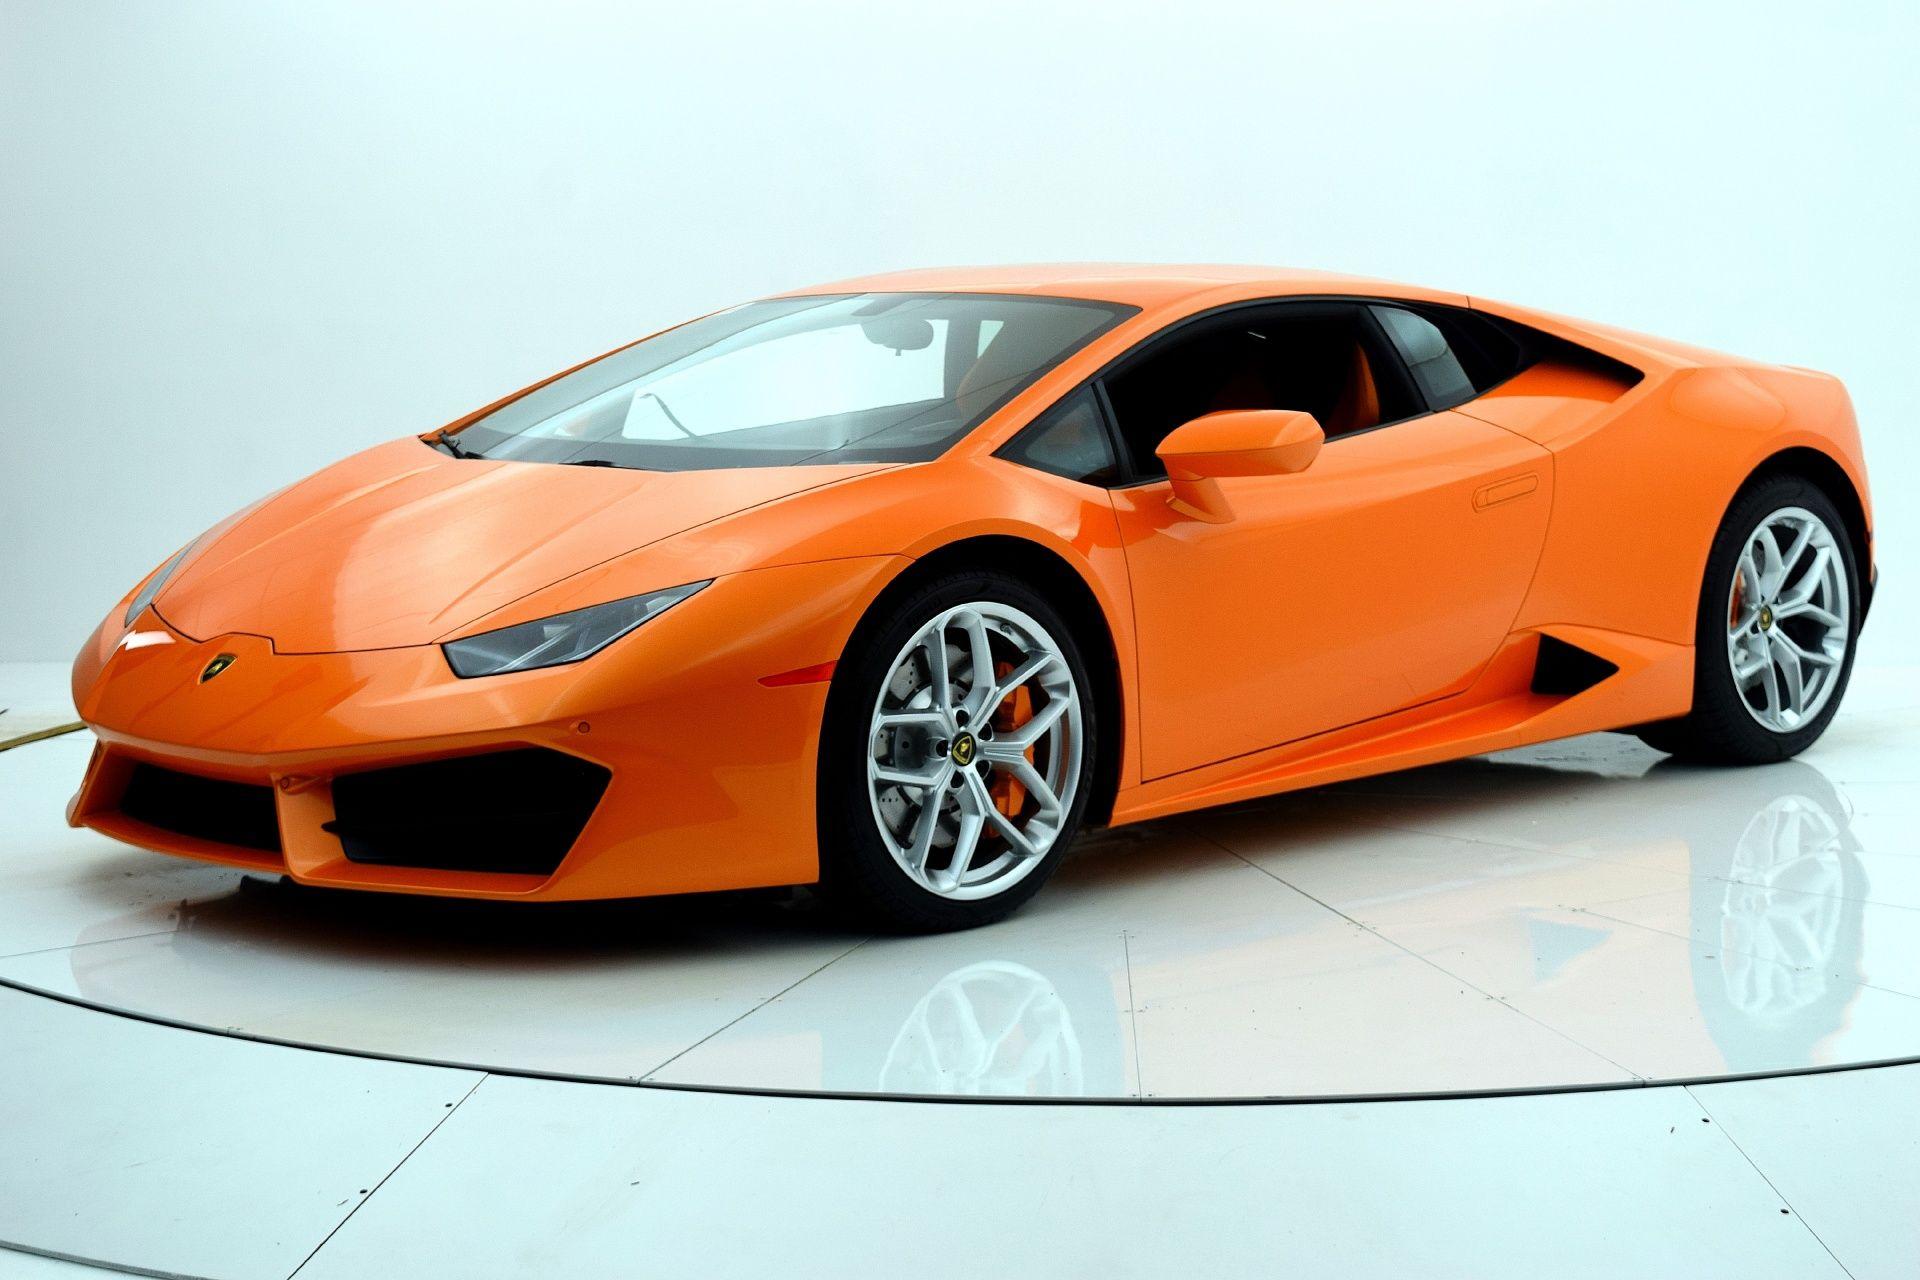 87db8b0544e81b66d1445deba9bc087a Modern Lamborghini Huracán Spyder Lp 610-4 Cars Trend